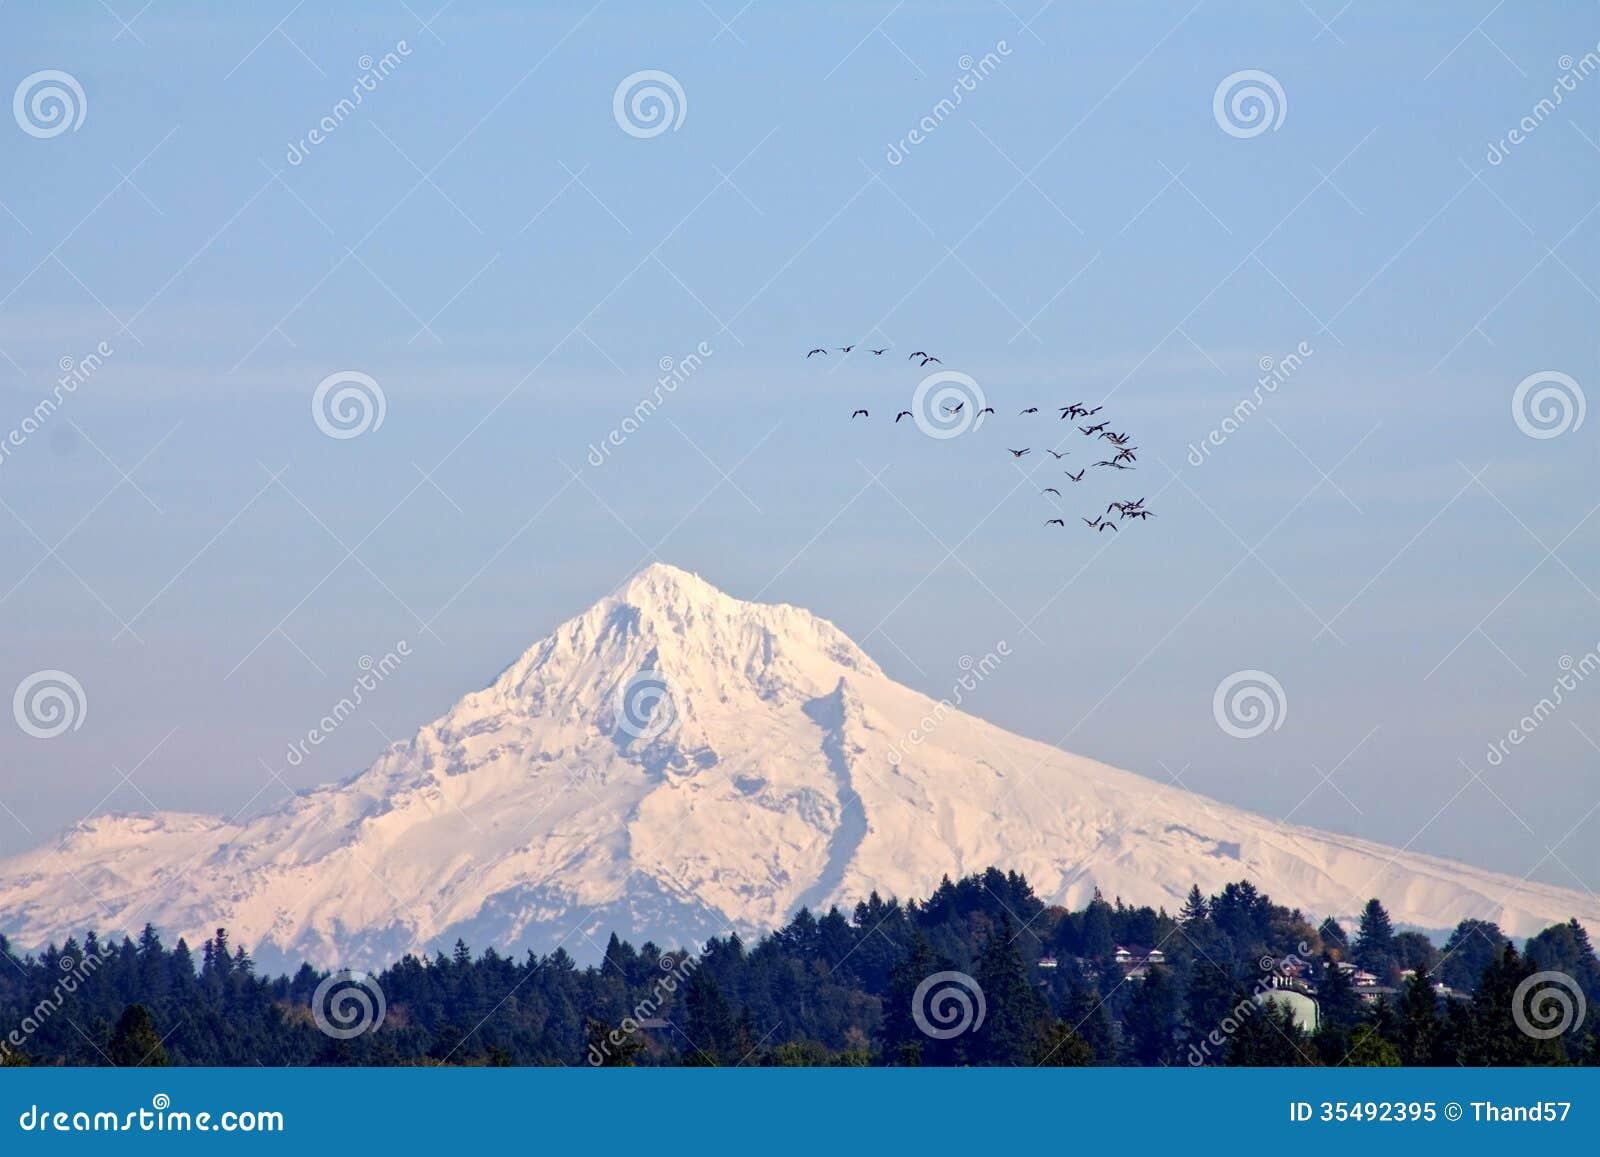 Mount Hood with geese flying